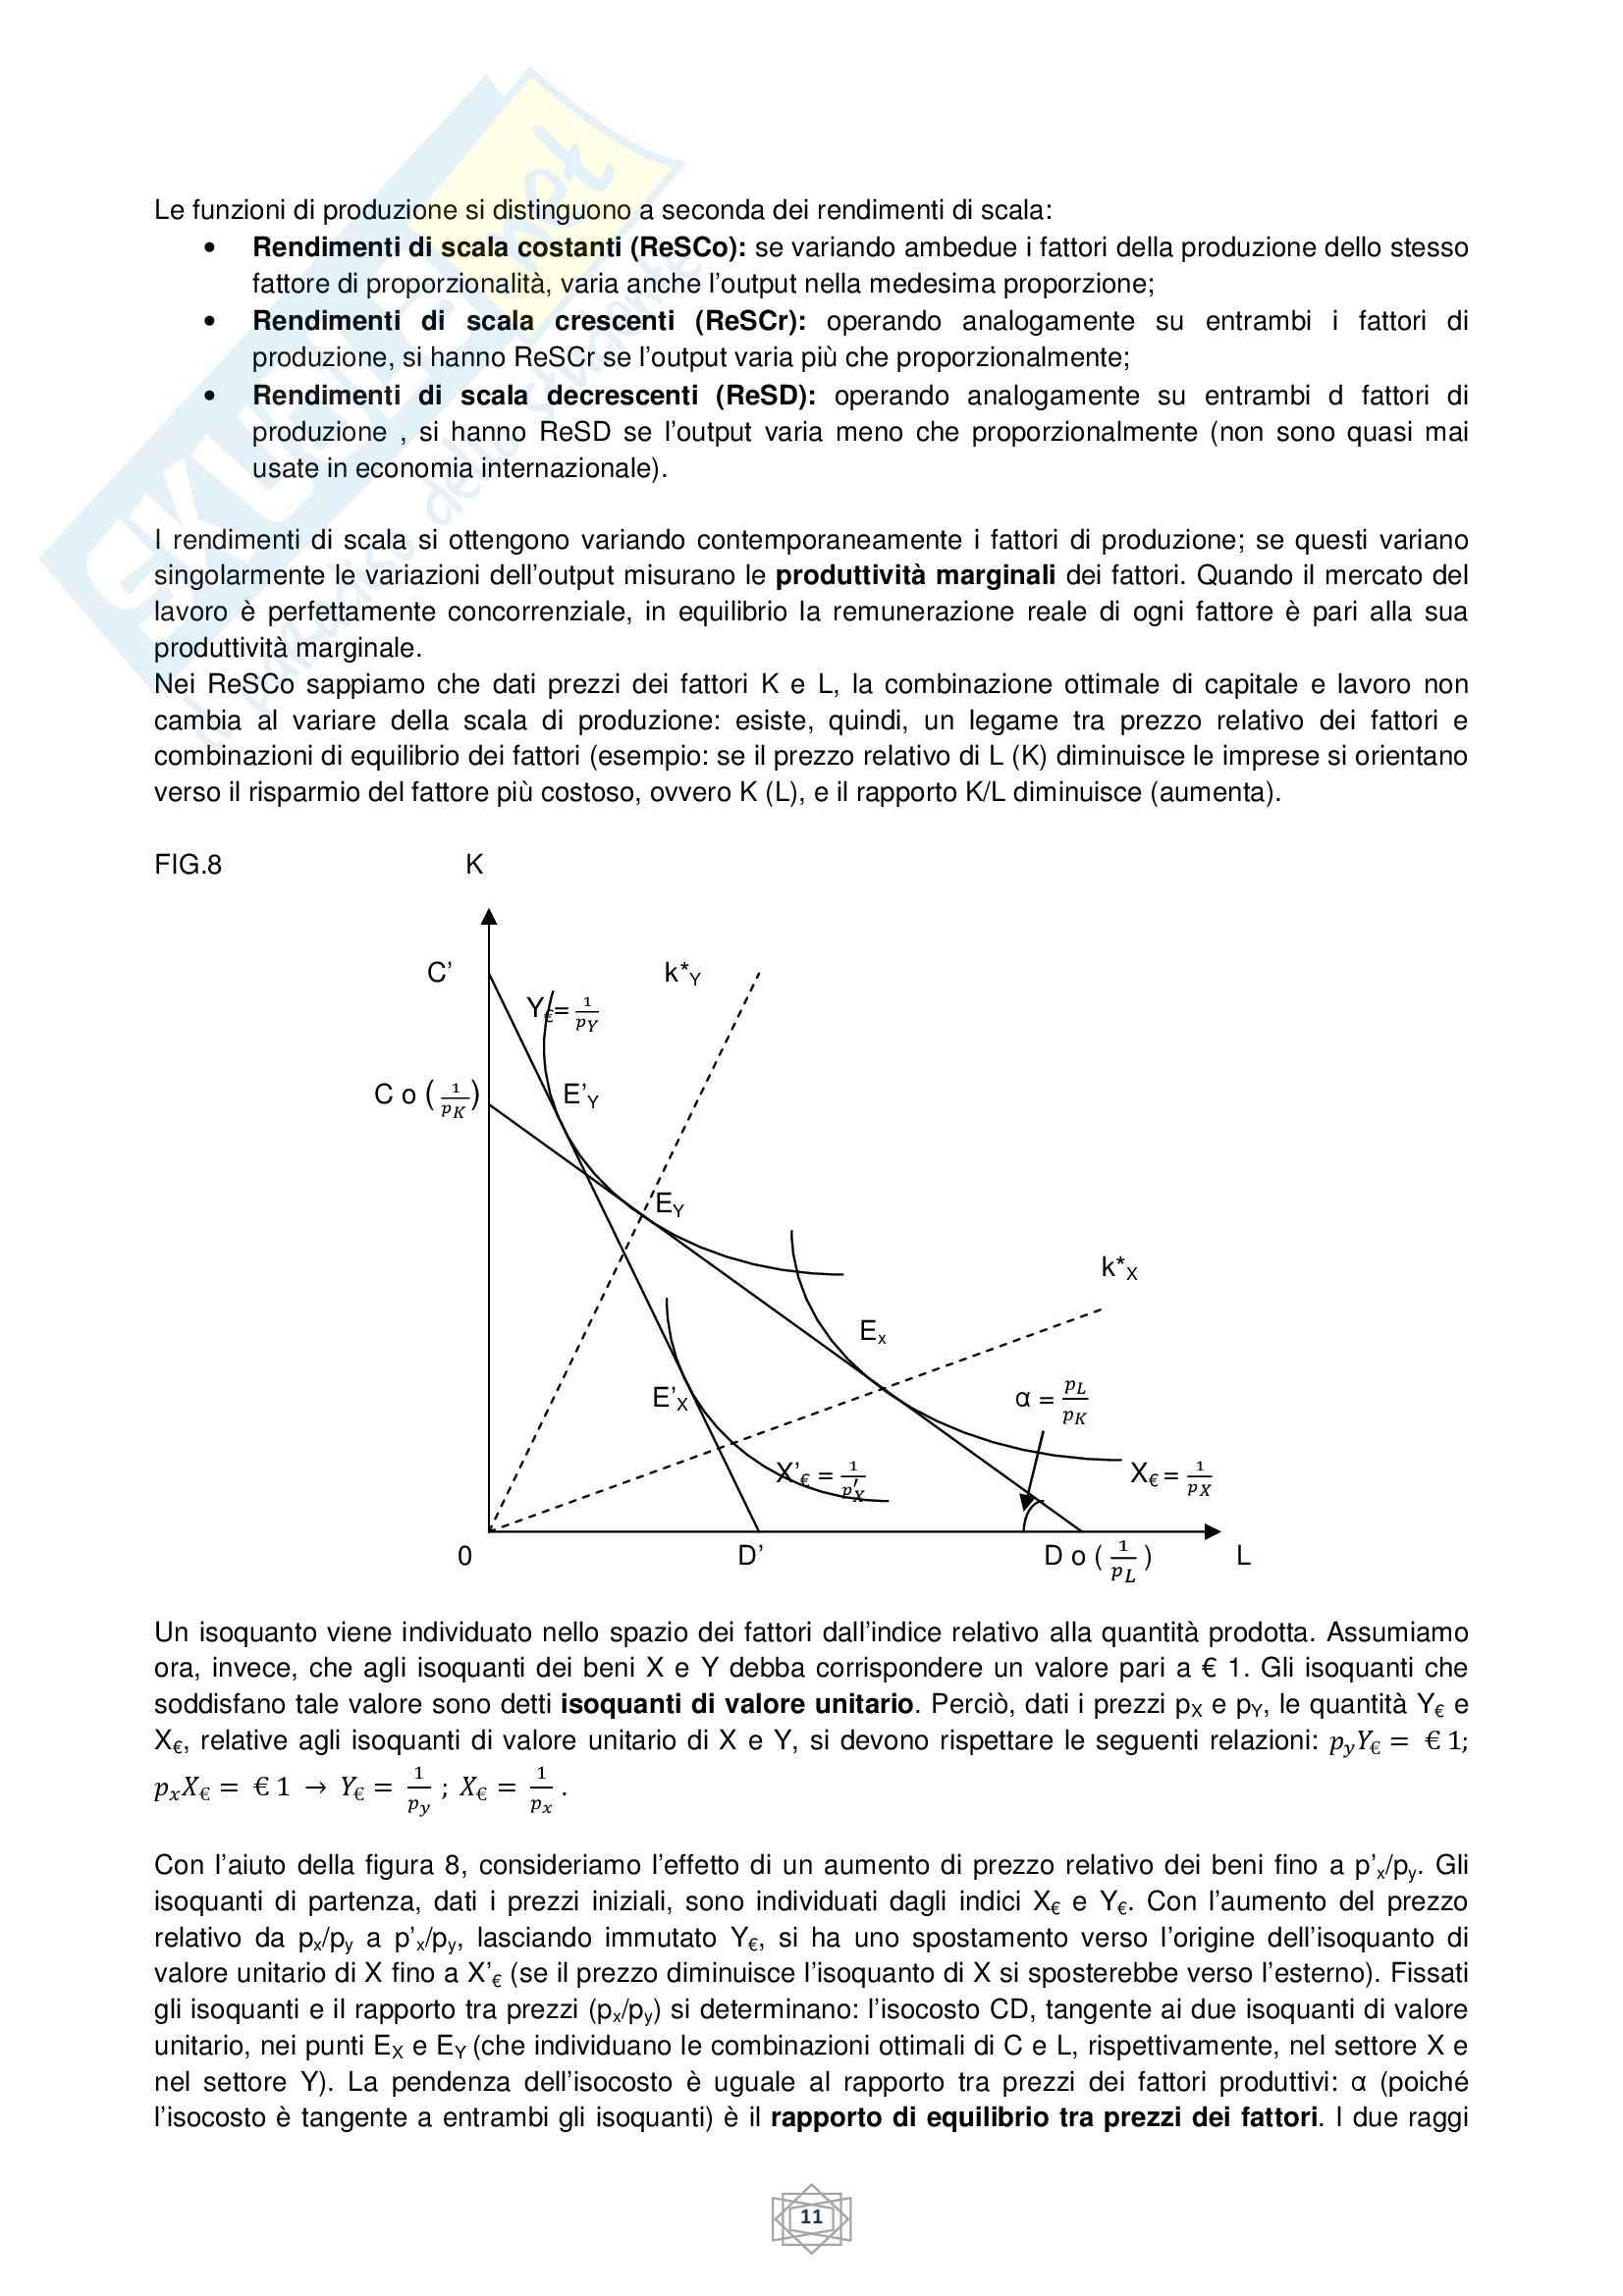 Riassunto esame Economia internazionale, prof. Atzeni, libro consigliato Economia internazionale, di De Arcangelis Pag. 11